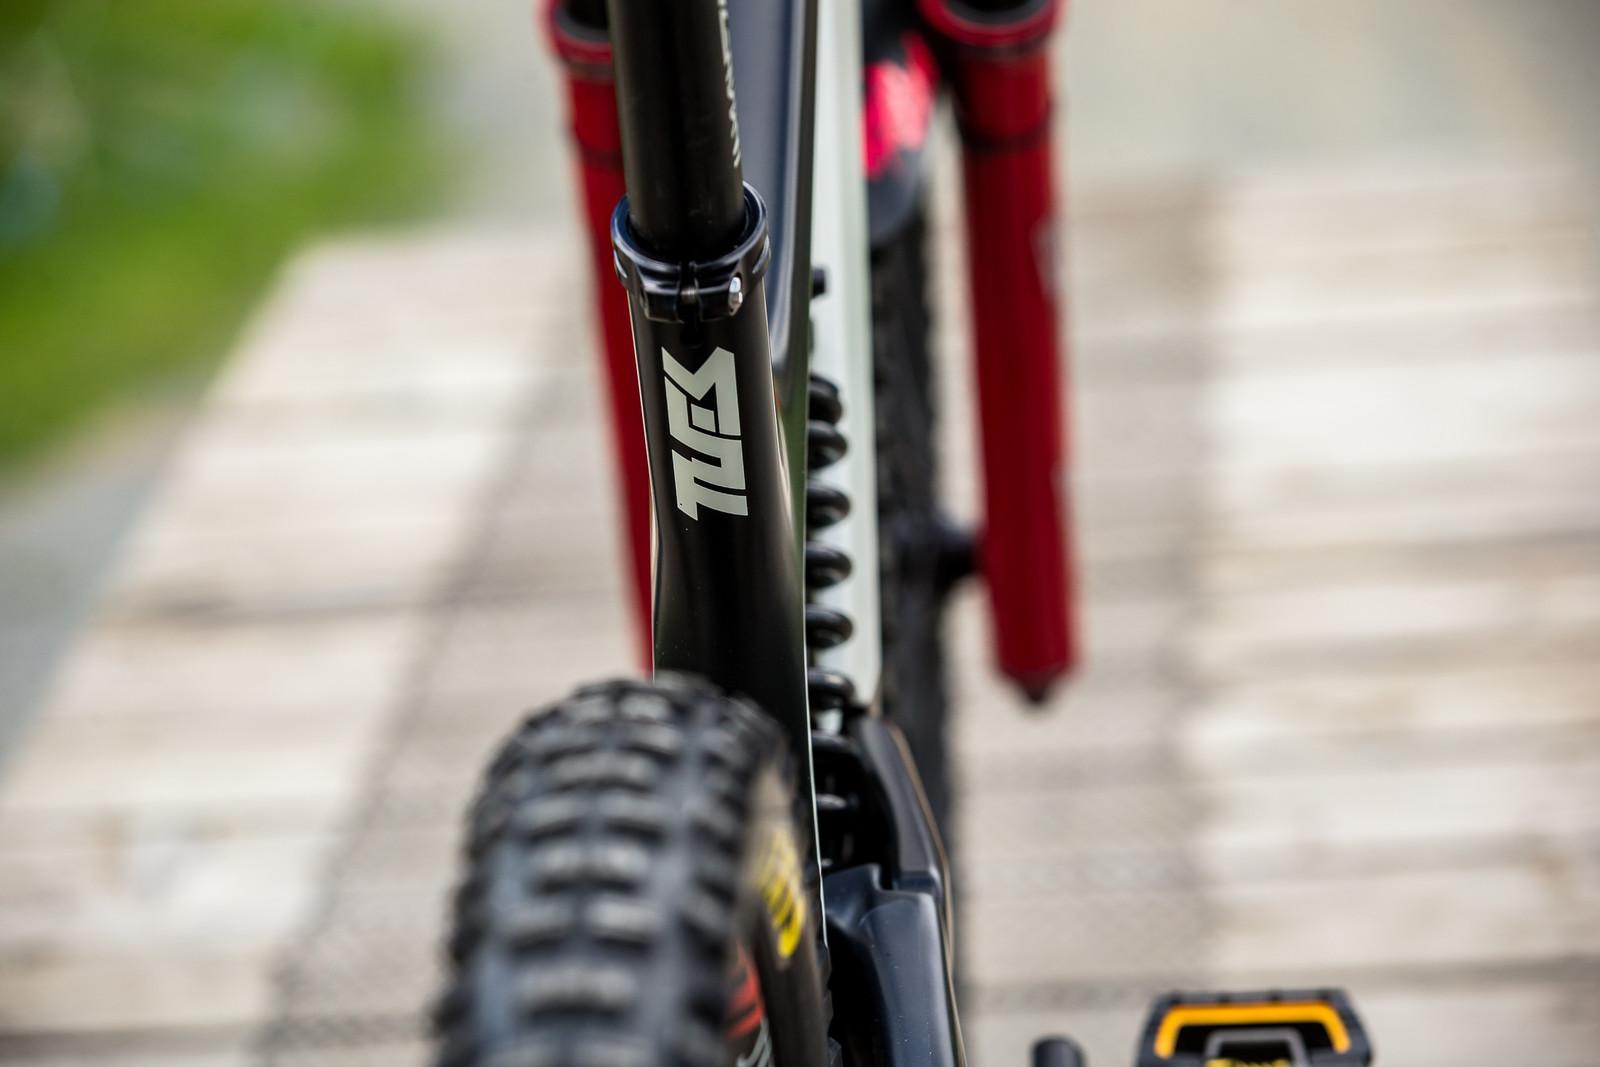 YT TUES Seat Tube - WINNING BIKE - Vali Höll's YT TUES - Mountain Biking Pictures - Vital MTB